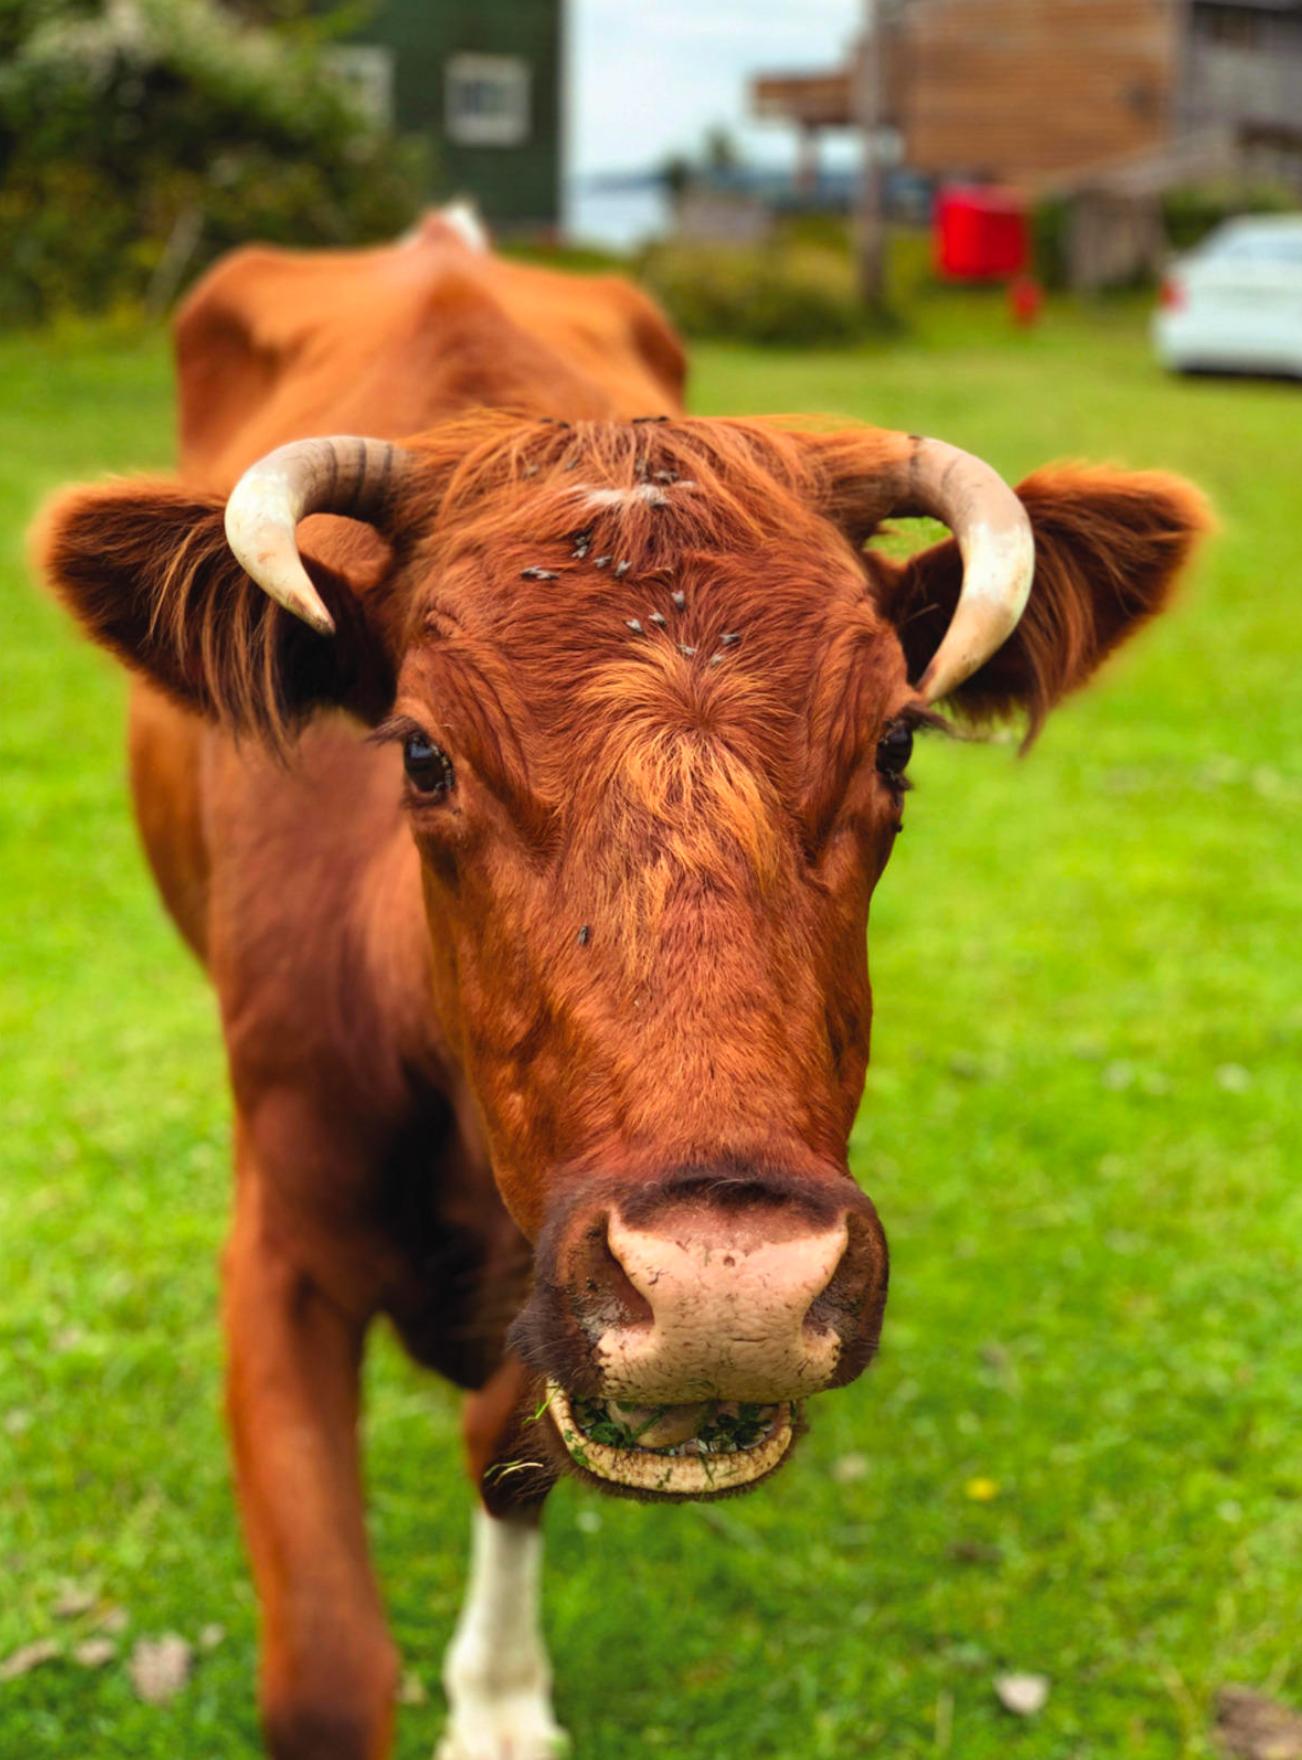 Where the Cows Roam Wild. Photo by Jane Mundy.